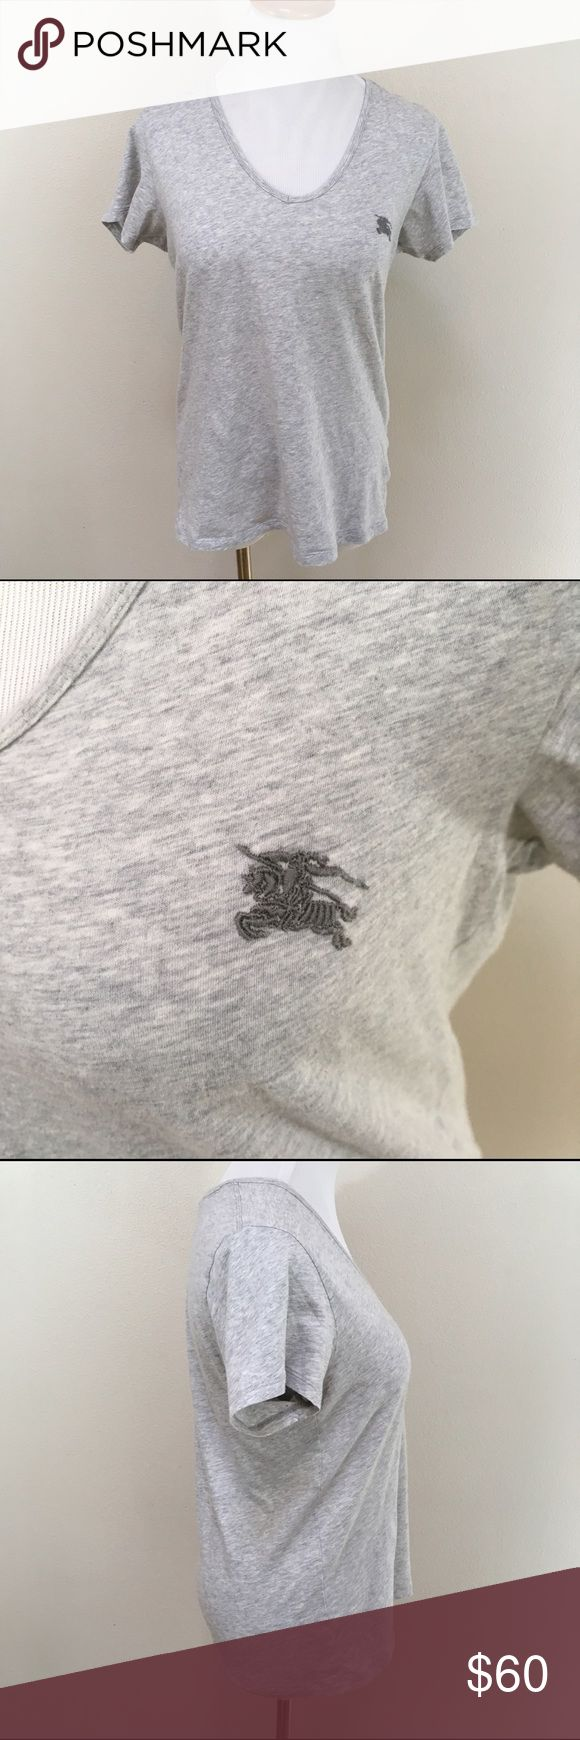 Burberry Brit Short Sleeve V-neck TShirt Small Burberry Brit Light Gray Short Sleeve V-Neck Tee Shirt Top Women's Small. Burberry Tops Tees - Short Sleeve